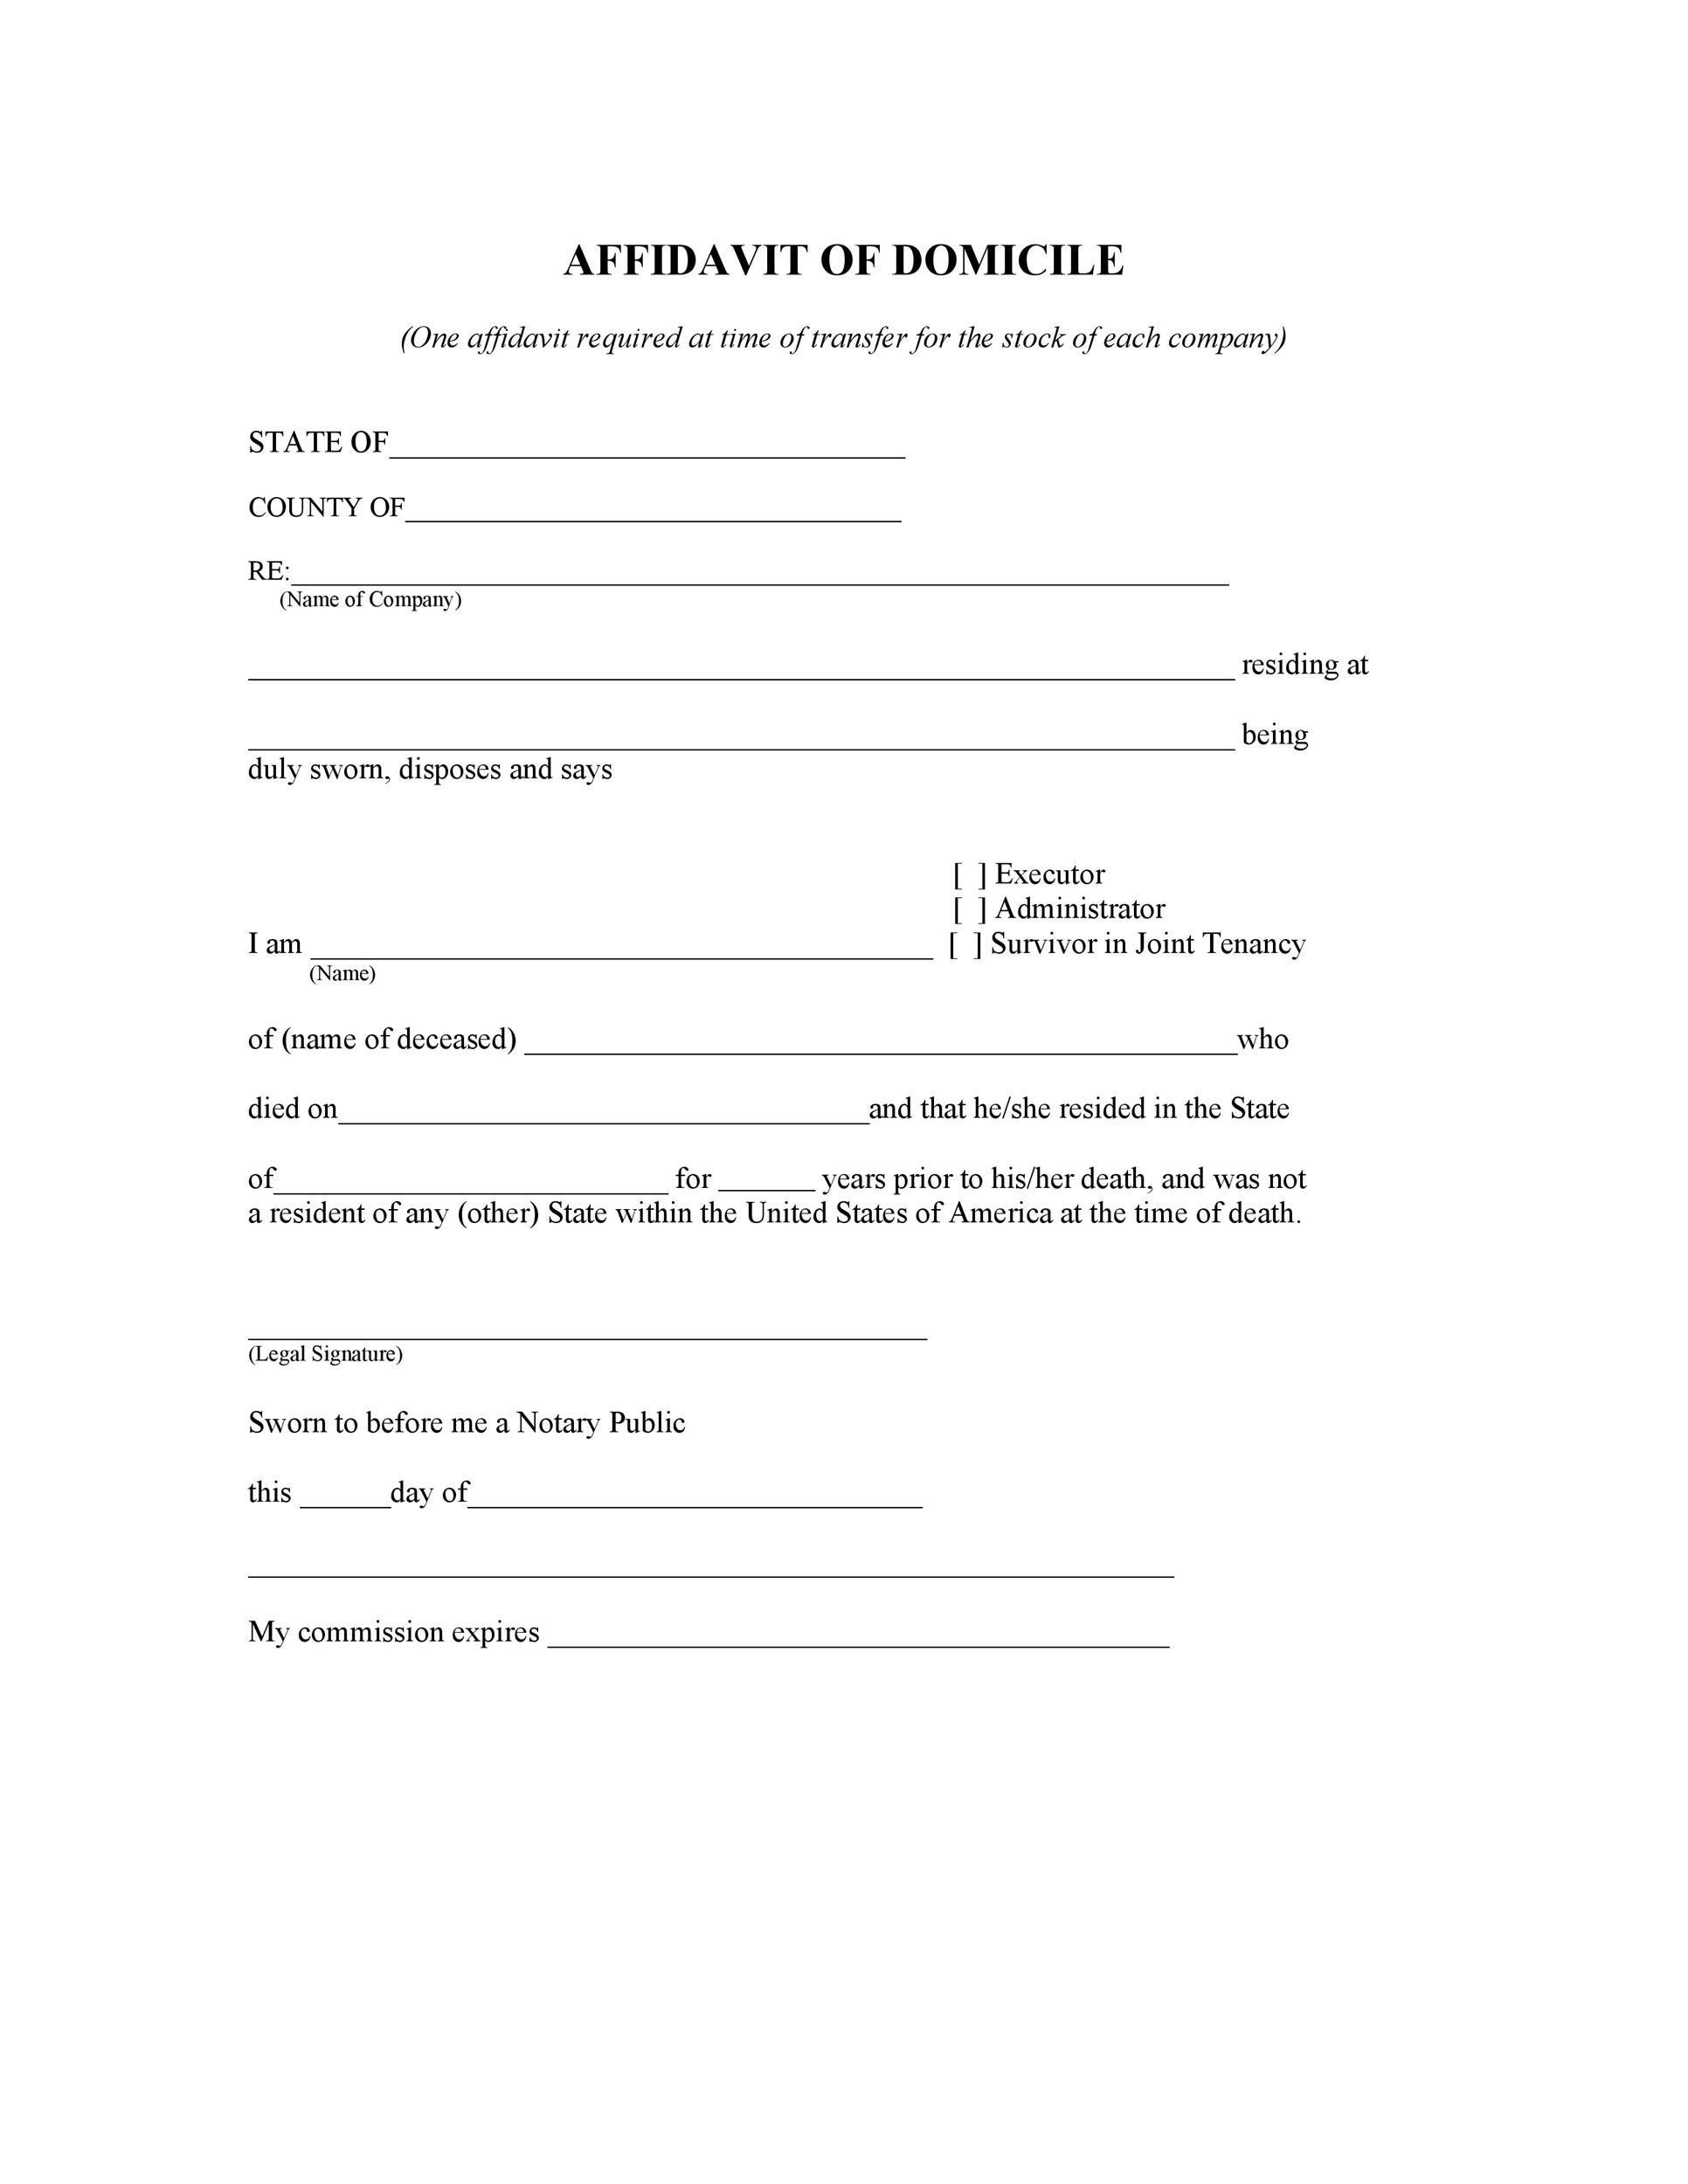 Free affidavit of domicile 18